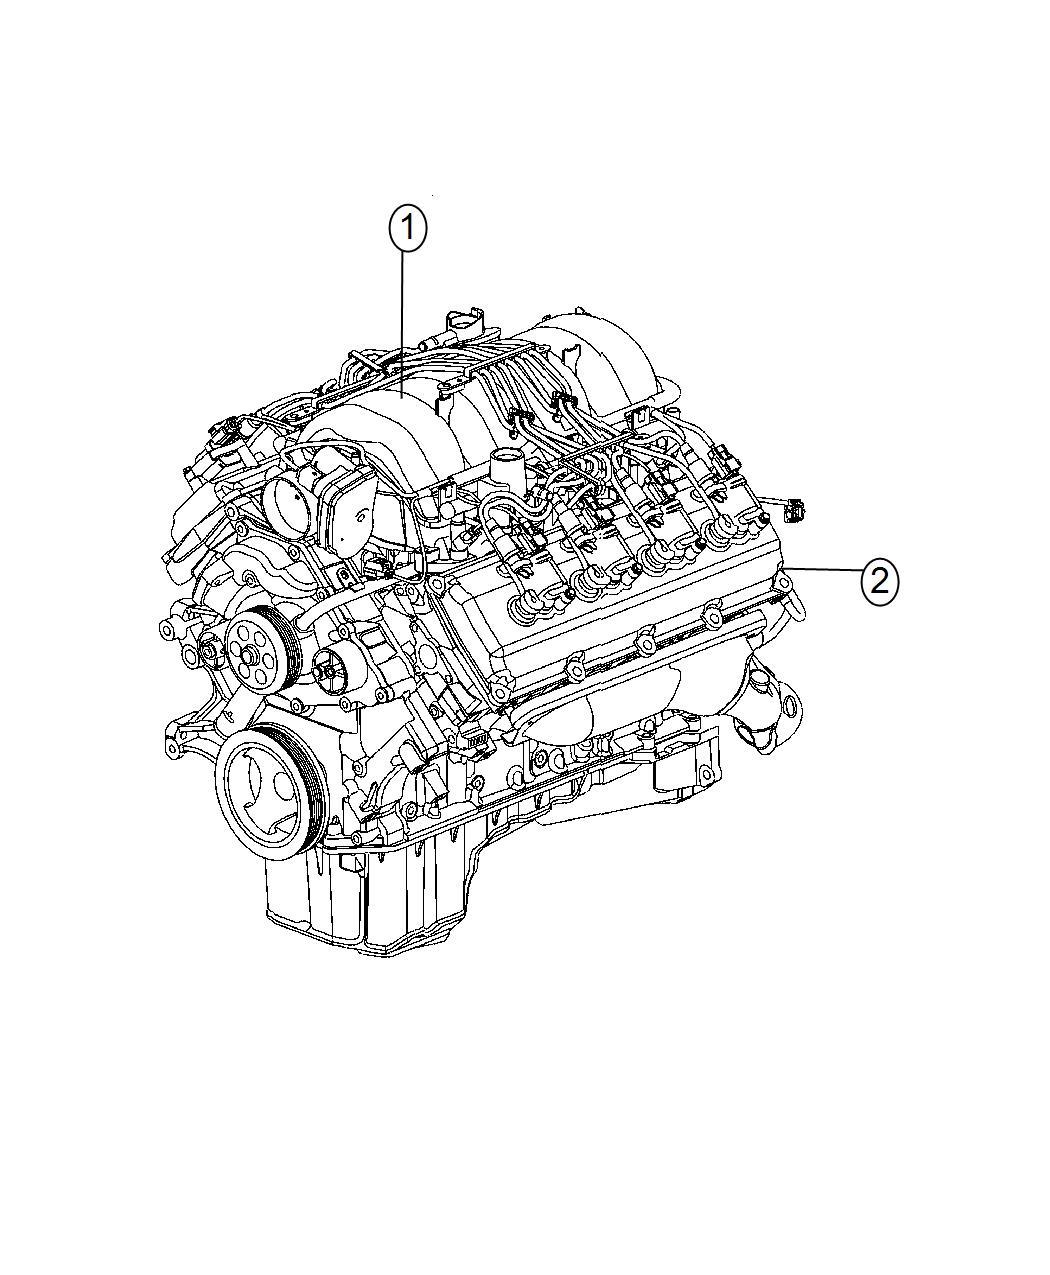 Dodge Challenger Engine. Complete. Mds, long, service